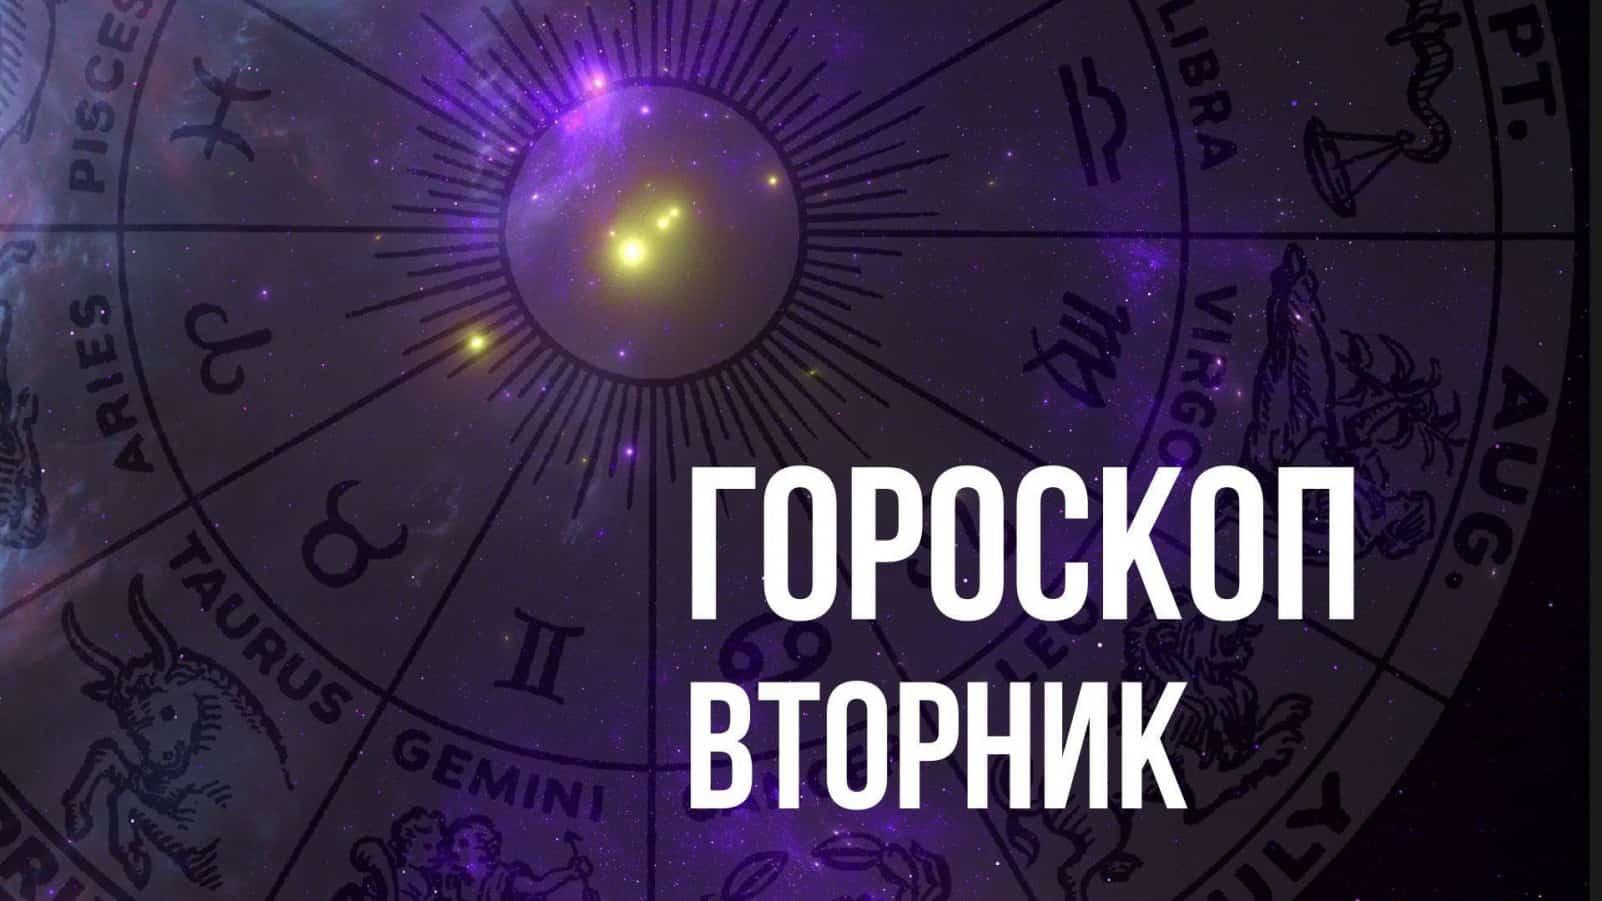 Гороскоп на вторник 9 марта для каждого знака Зодиака